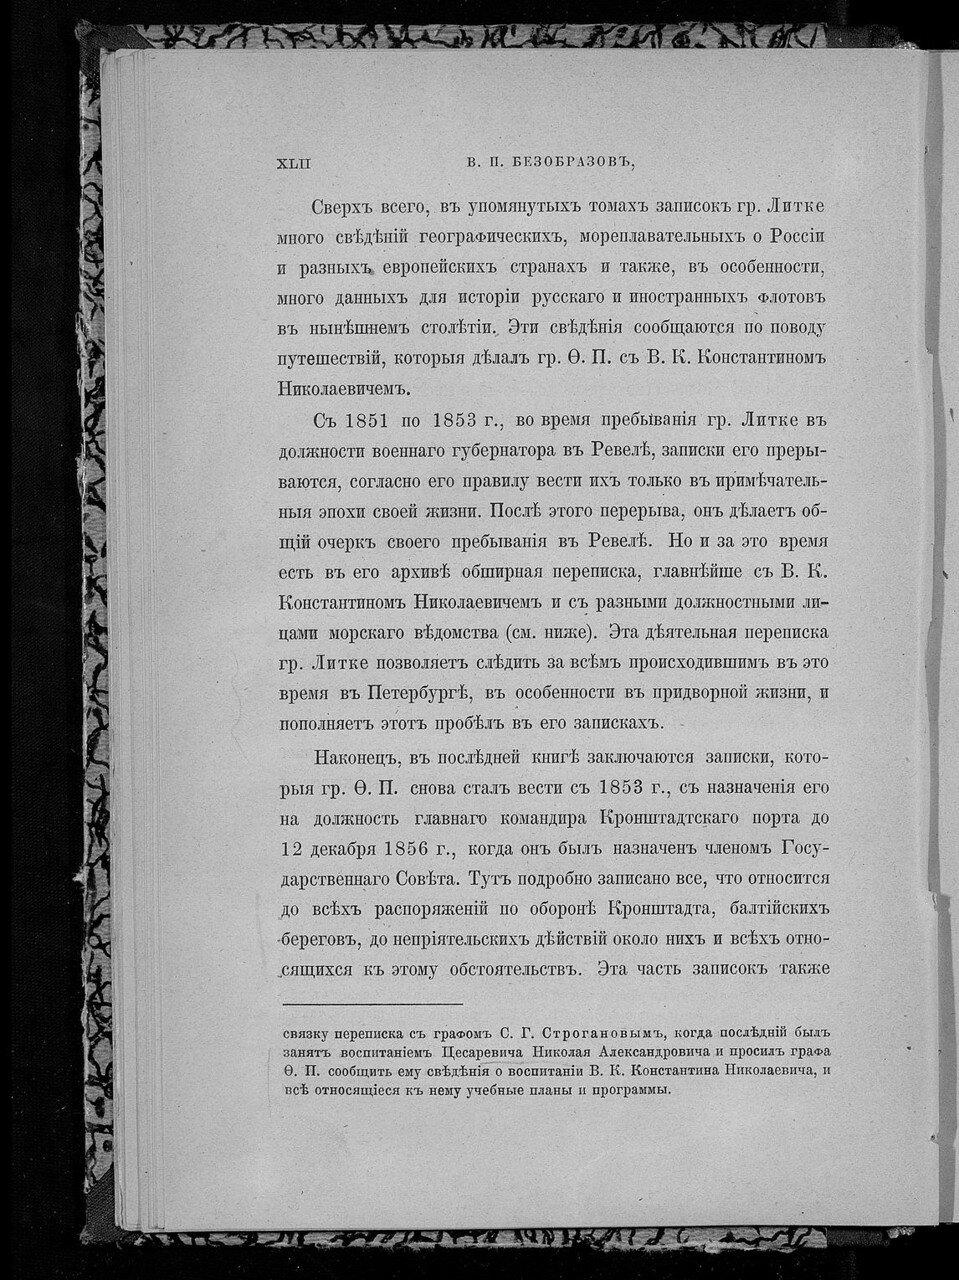 https://img-fotki.yandex.ru/get/880375/199368979.d2/0_21dd7c_70330332_XXXL.jpg